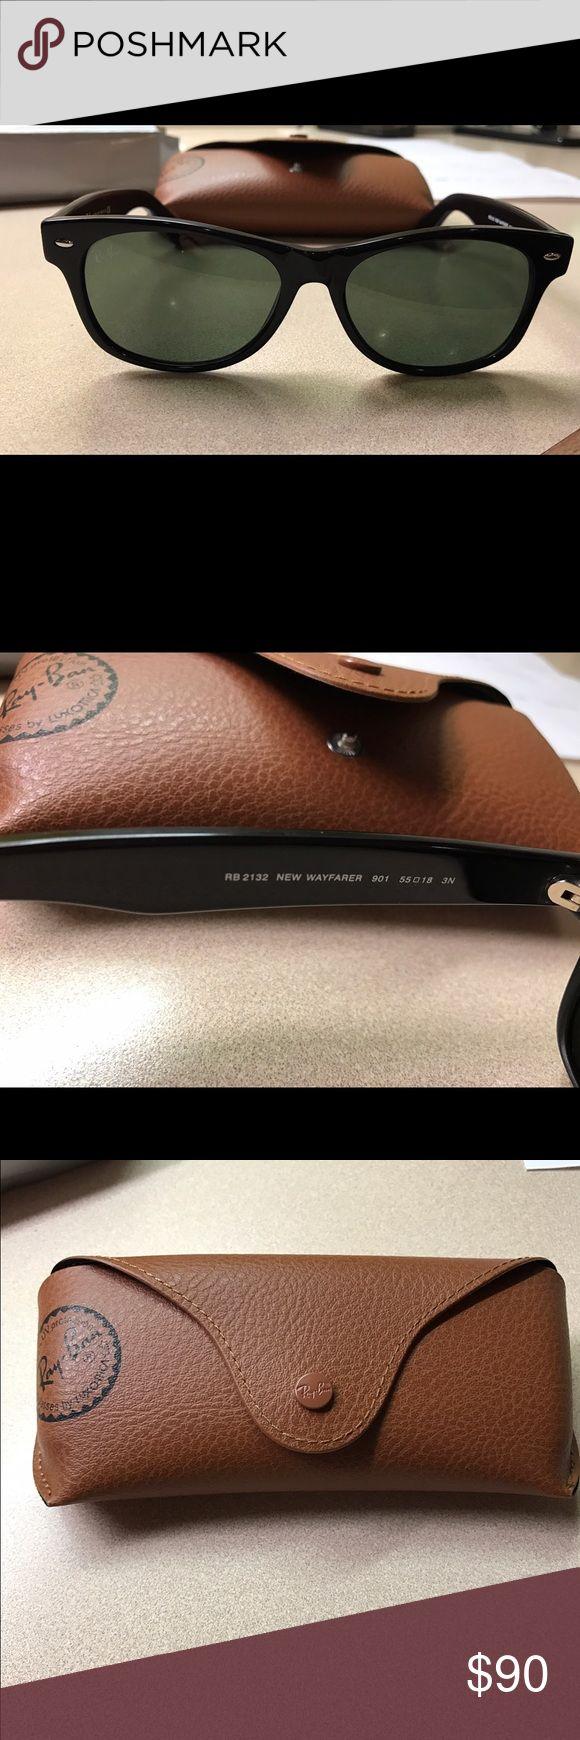 ray ban rb4105 folding wayfarer  ray ban wayfarer sunglasses